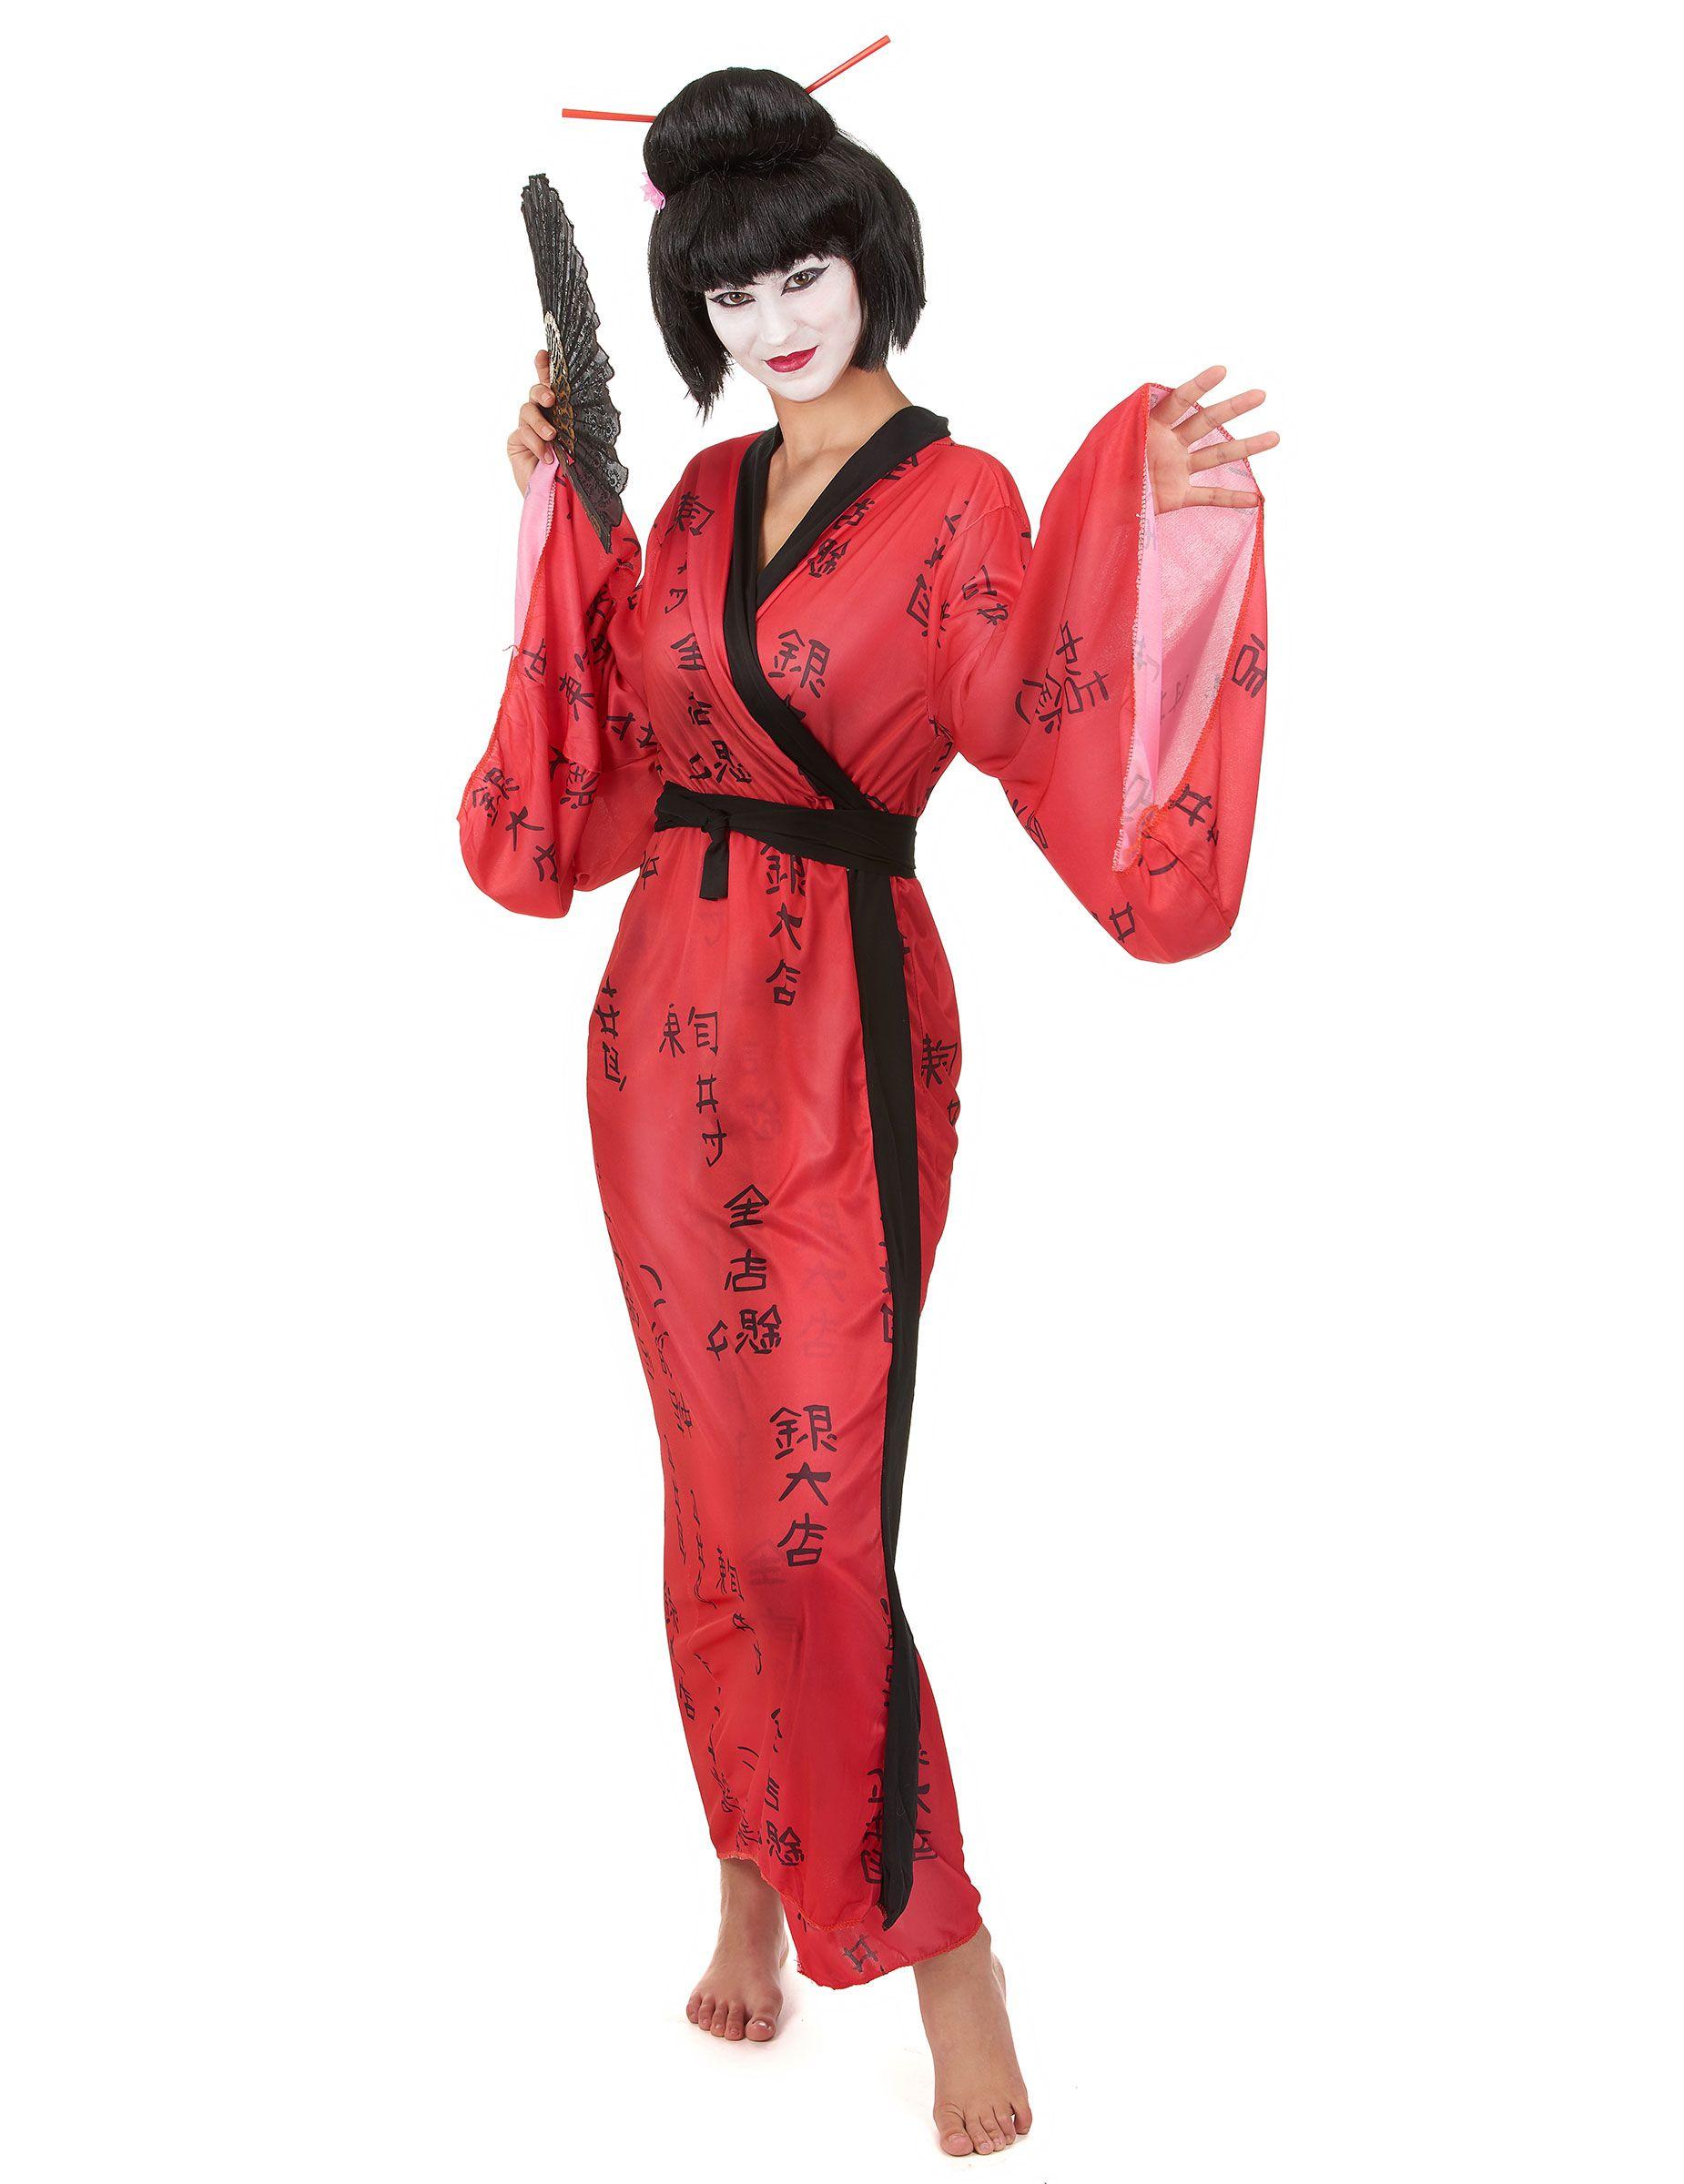 d guisement geisha femme deguisement geisha deguisement simple et eventail. Black Bedroom Furniture Sets. Home Design Ideas